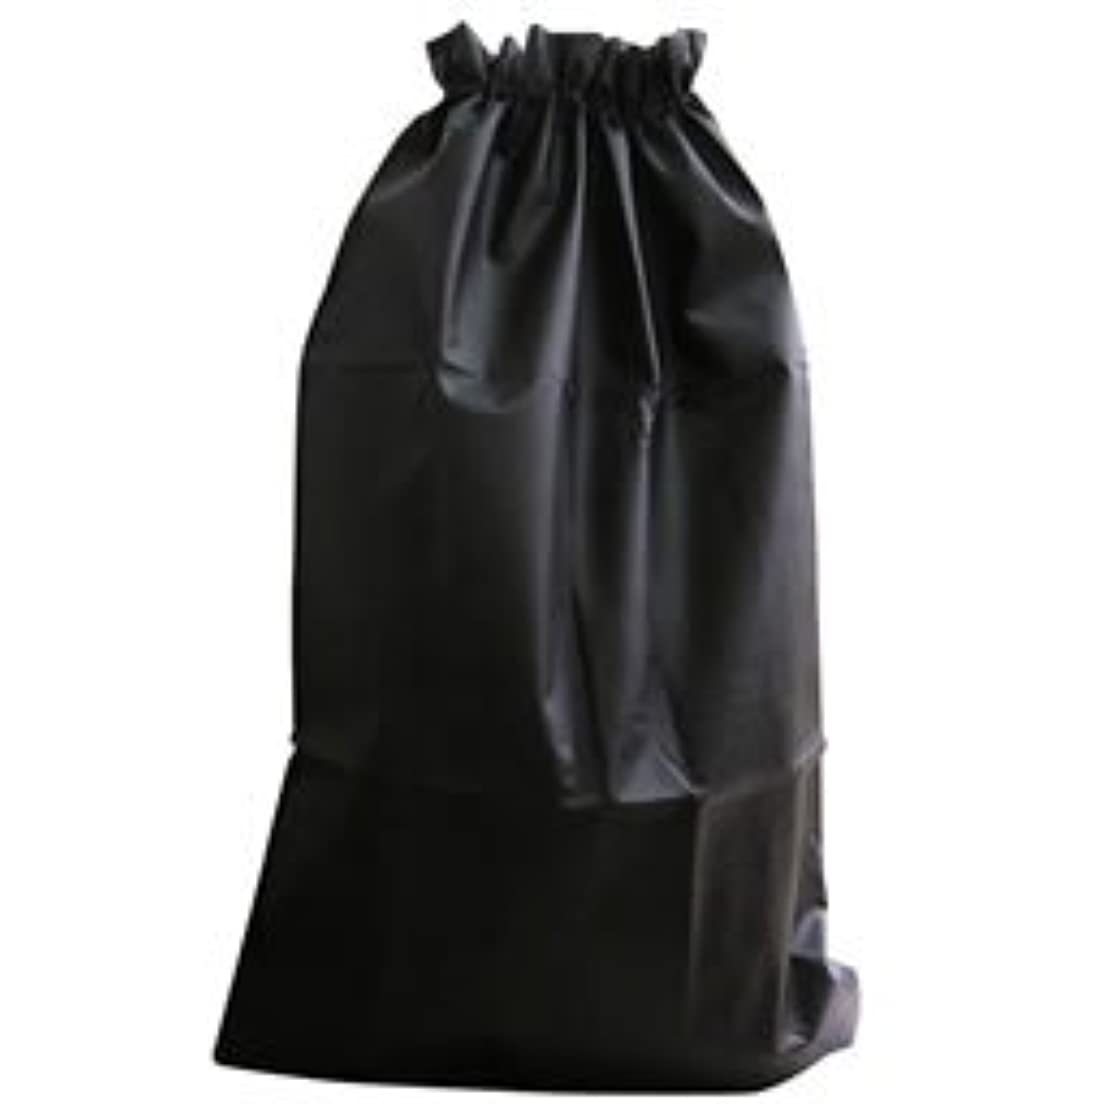 管理者辛い危険な特大巾着袋